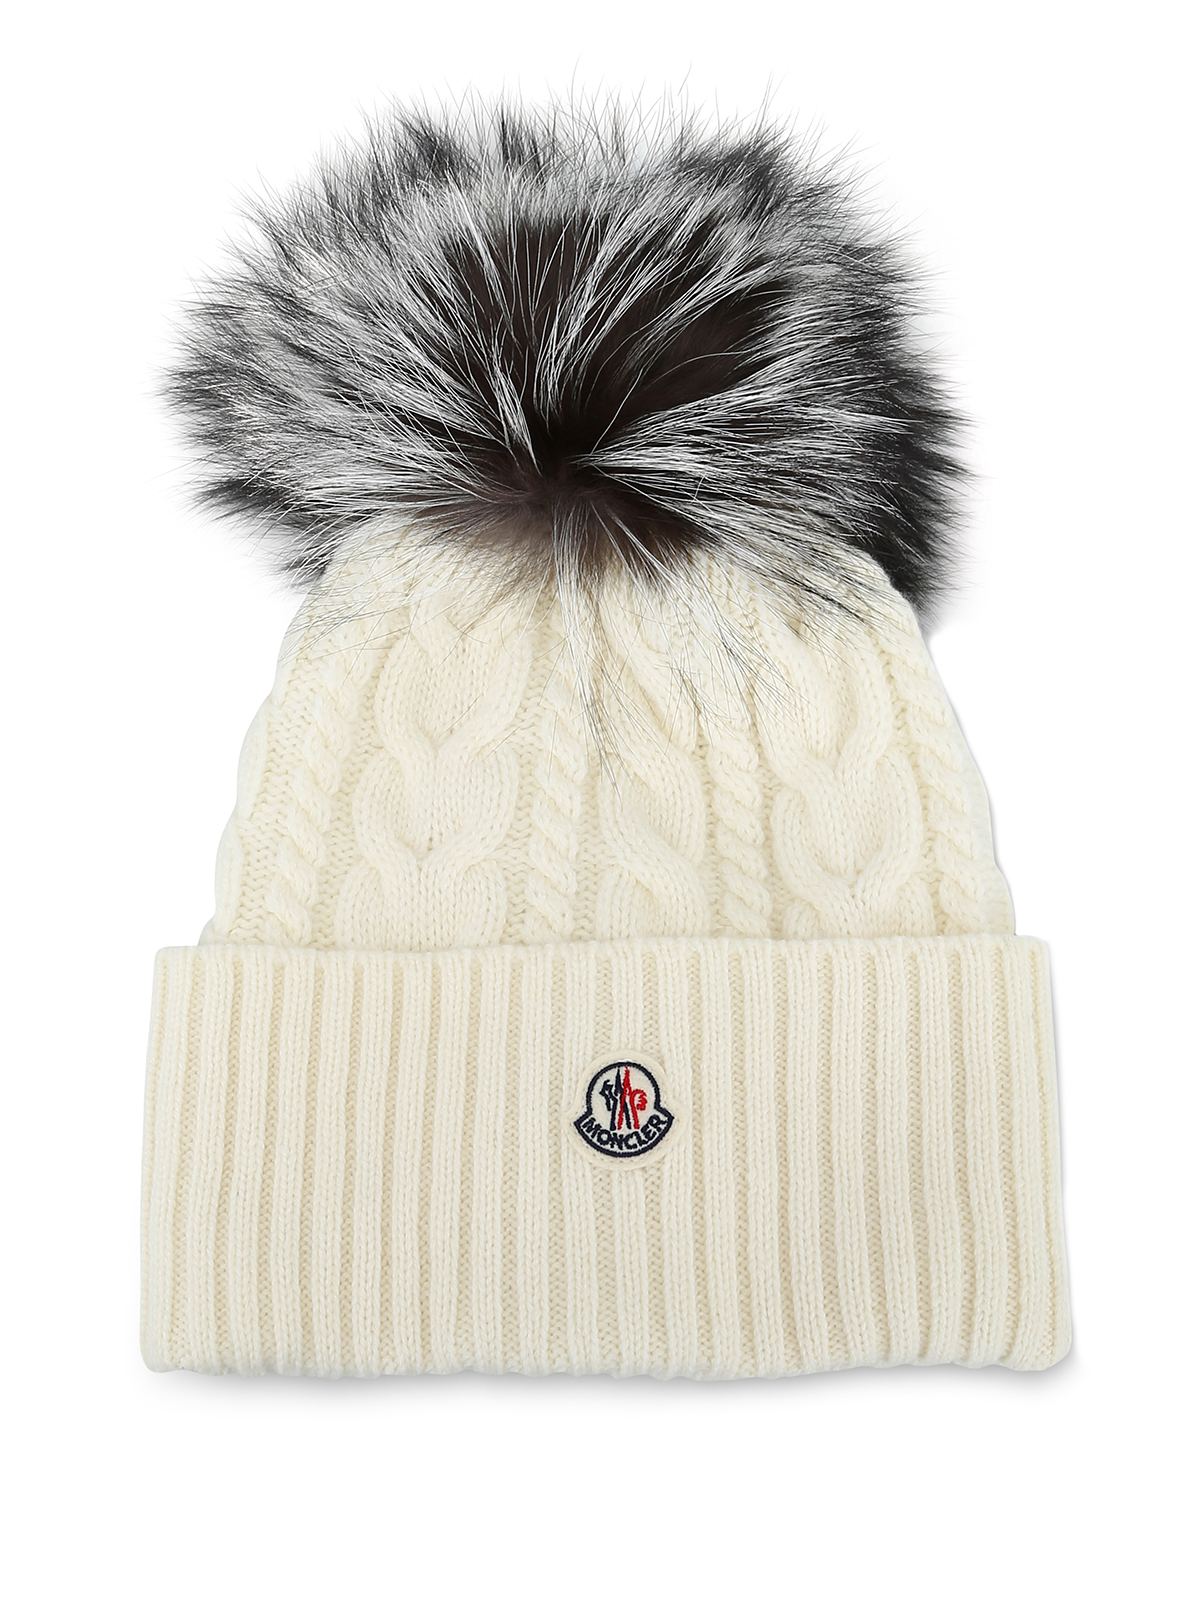 Moncler - Fur pompom white cable knit beanie - beanies - D2 093 ... 05e2c940ad7